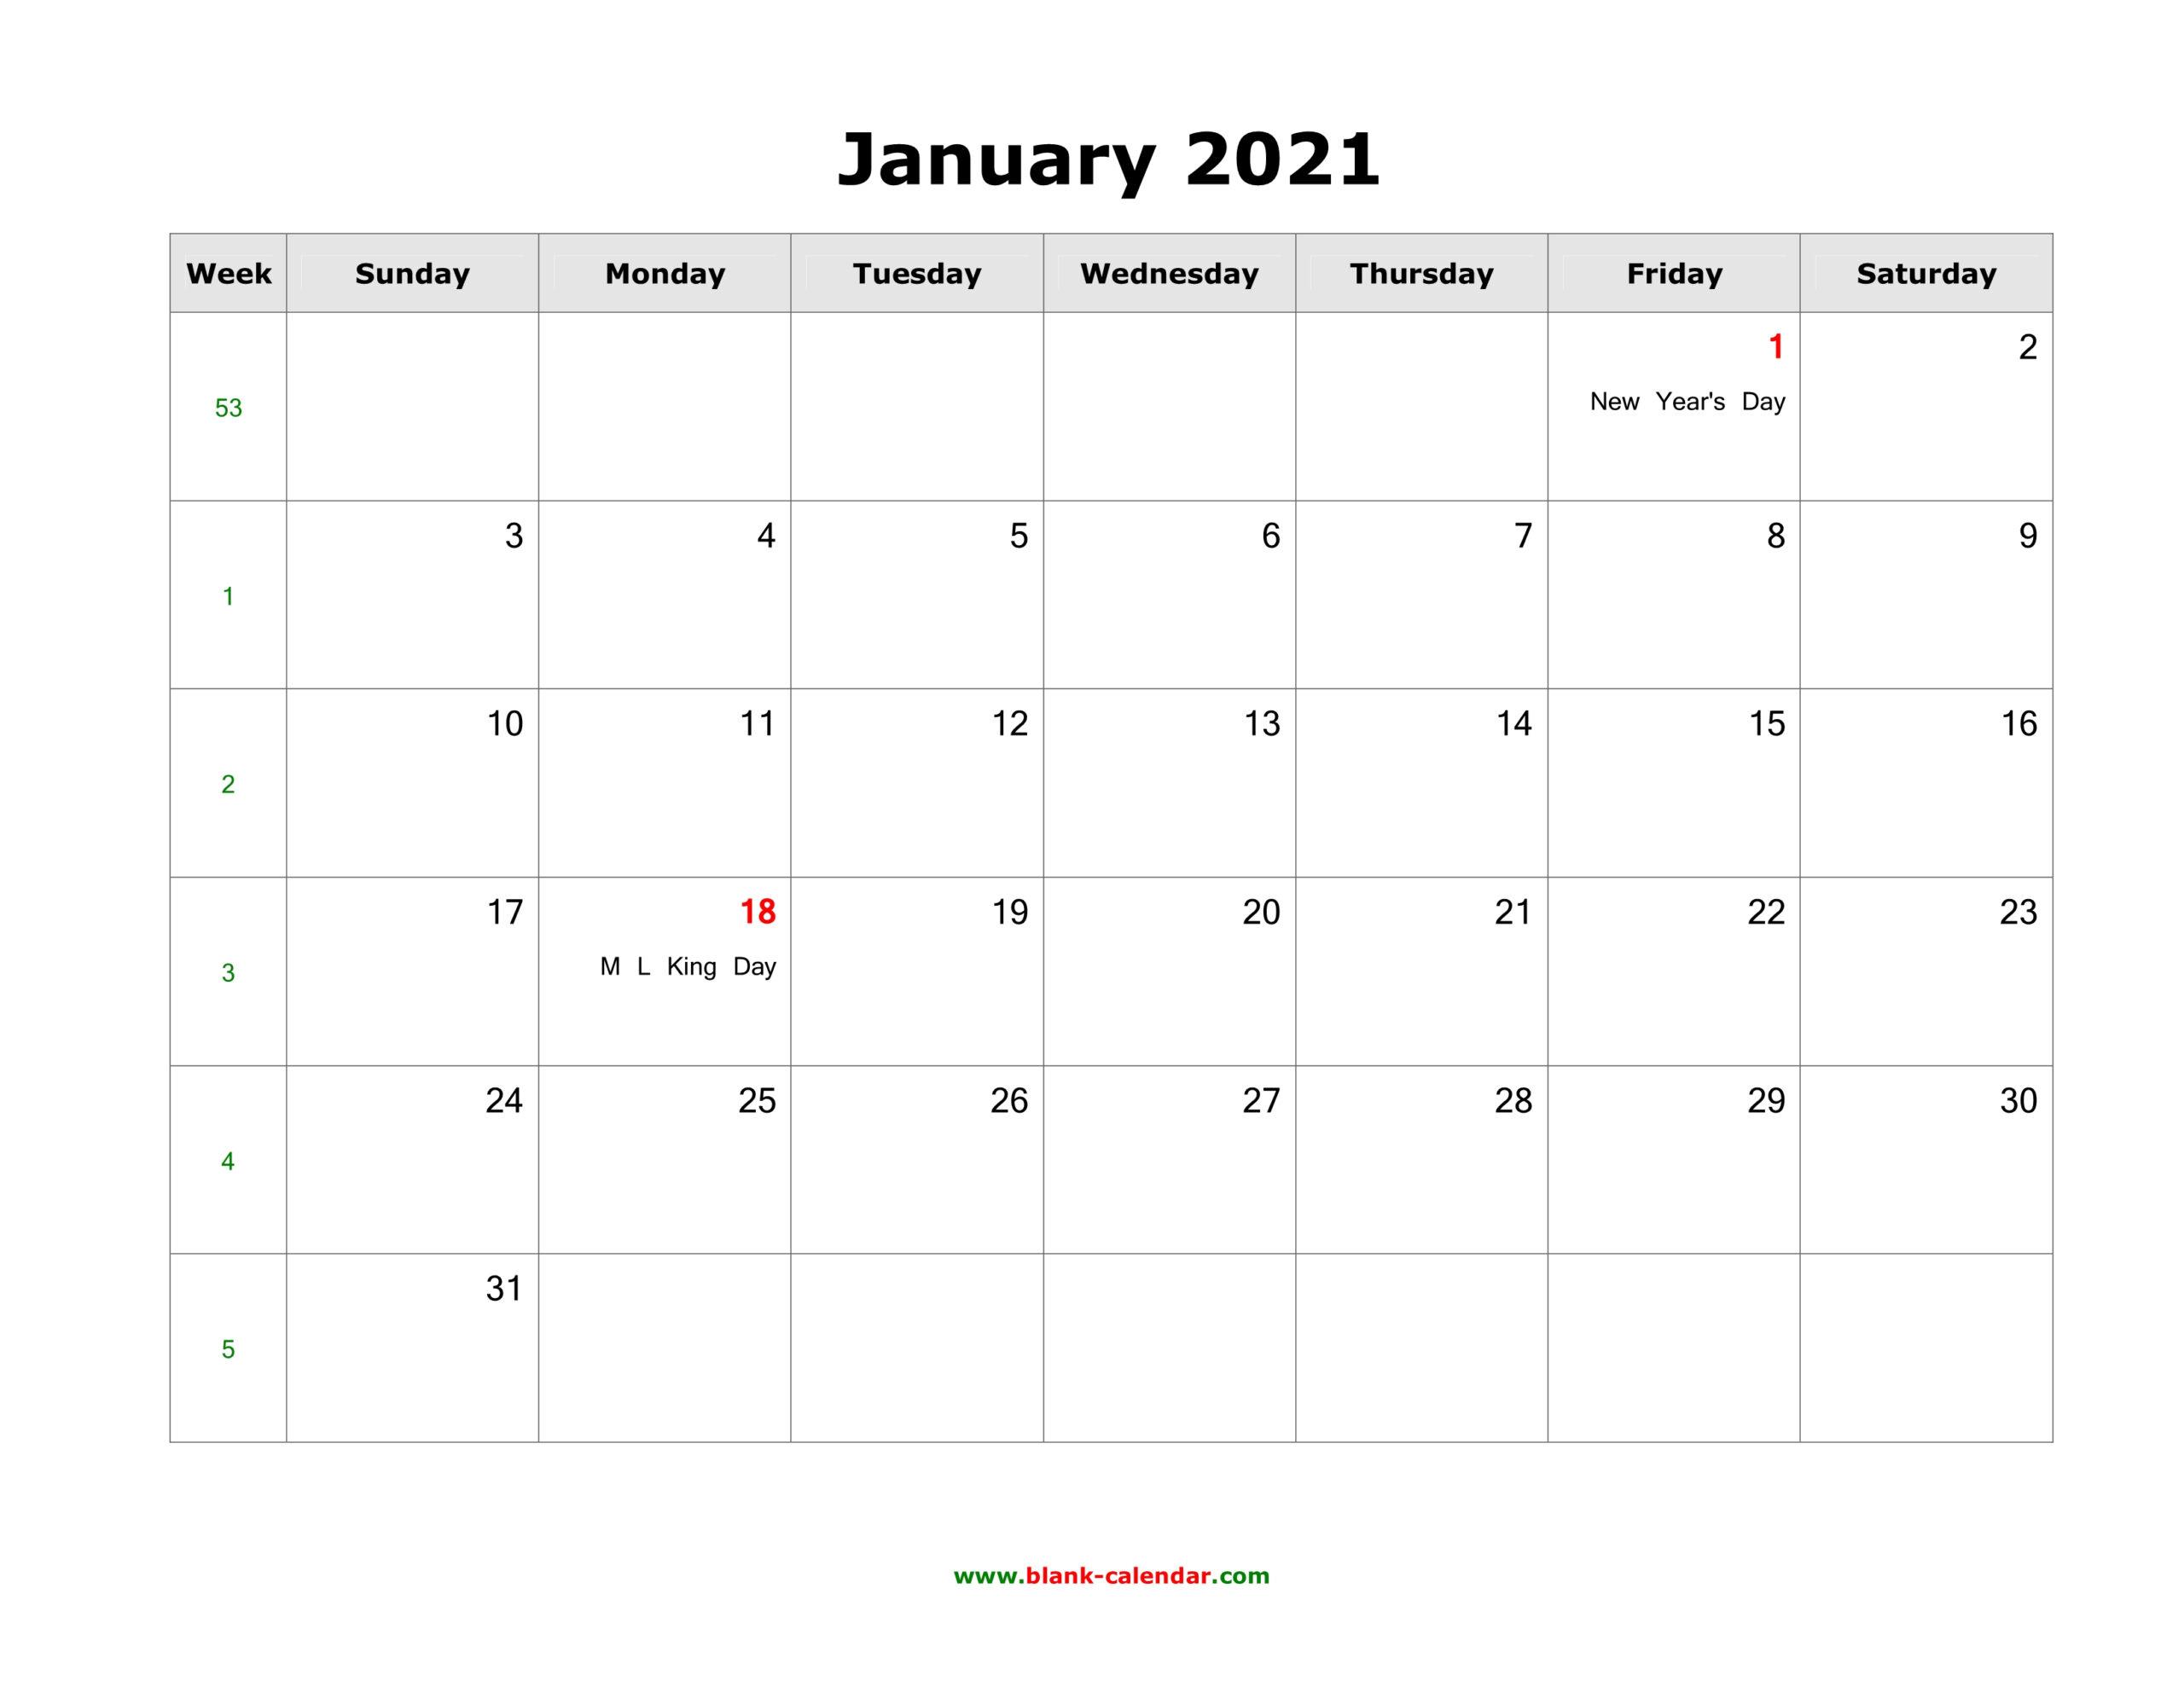 January 2021 Blank Calendar | Free Download Calendar Templates